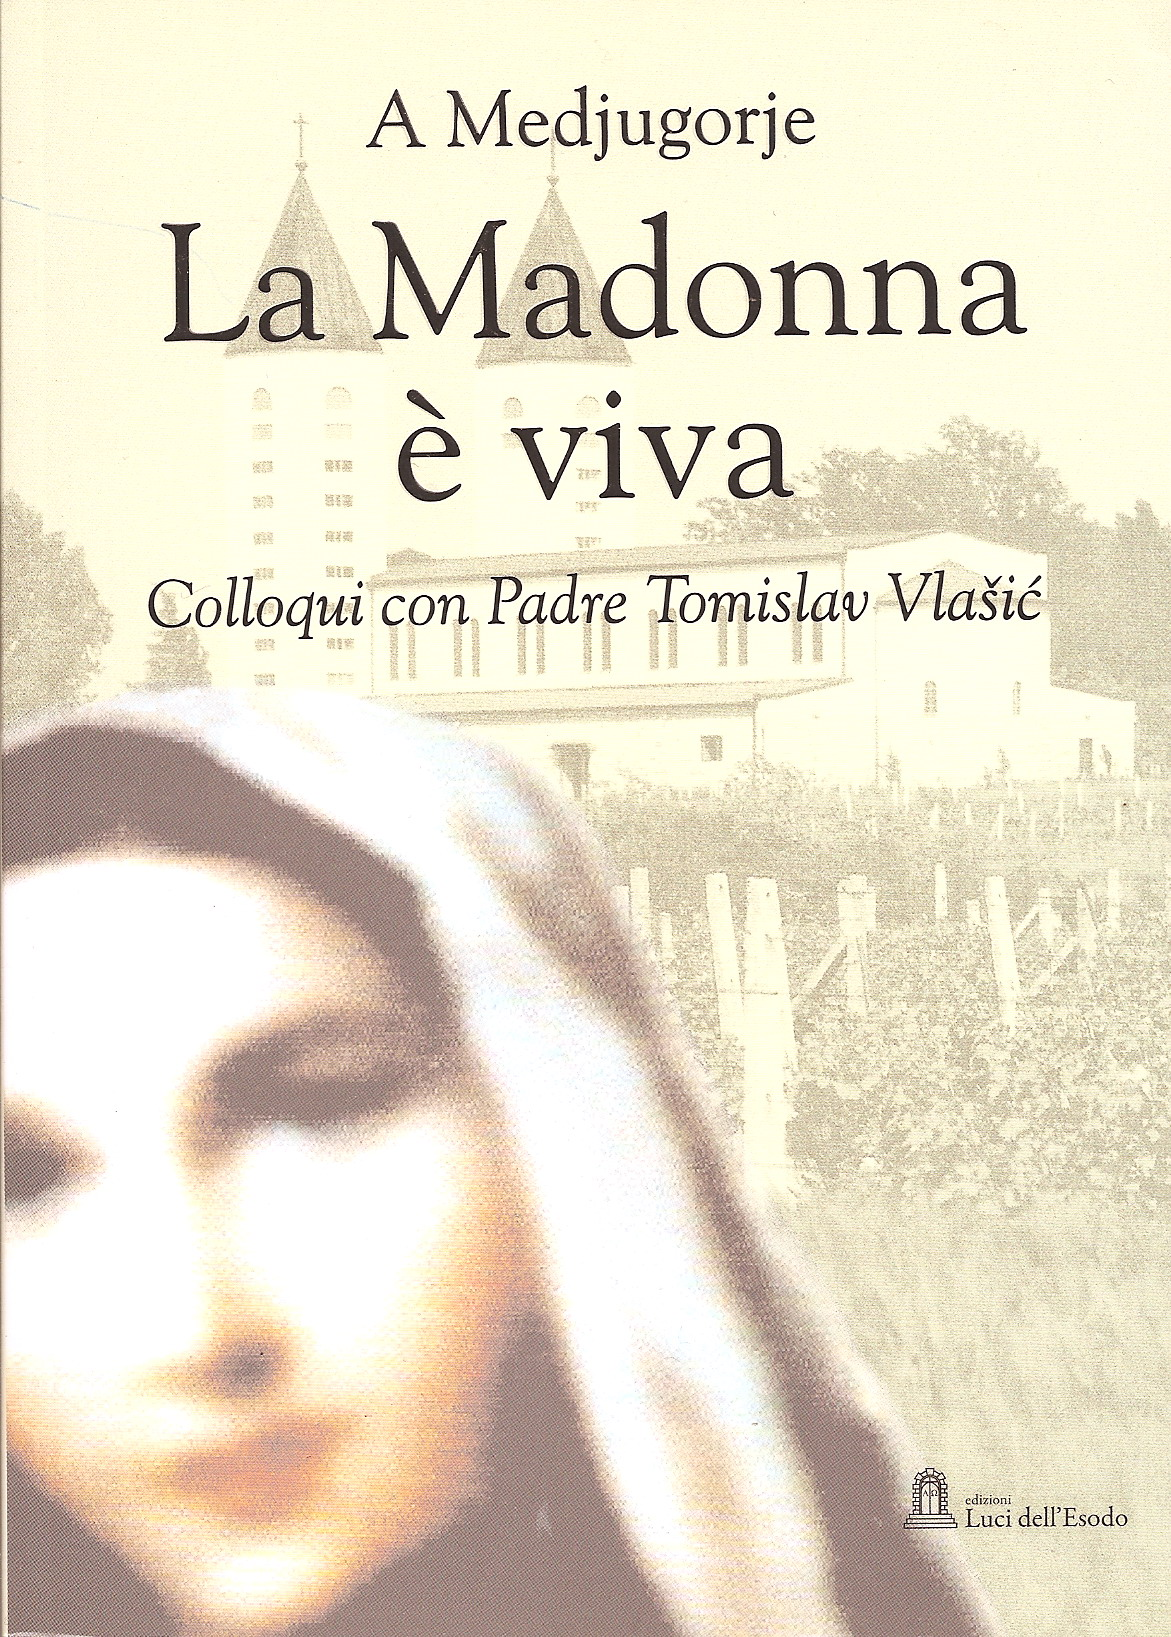 A Medjugorje la Madonna è viva